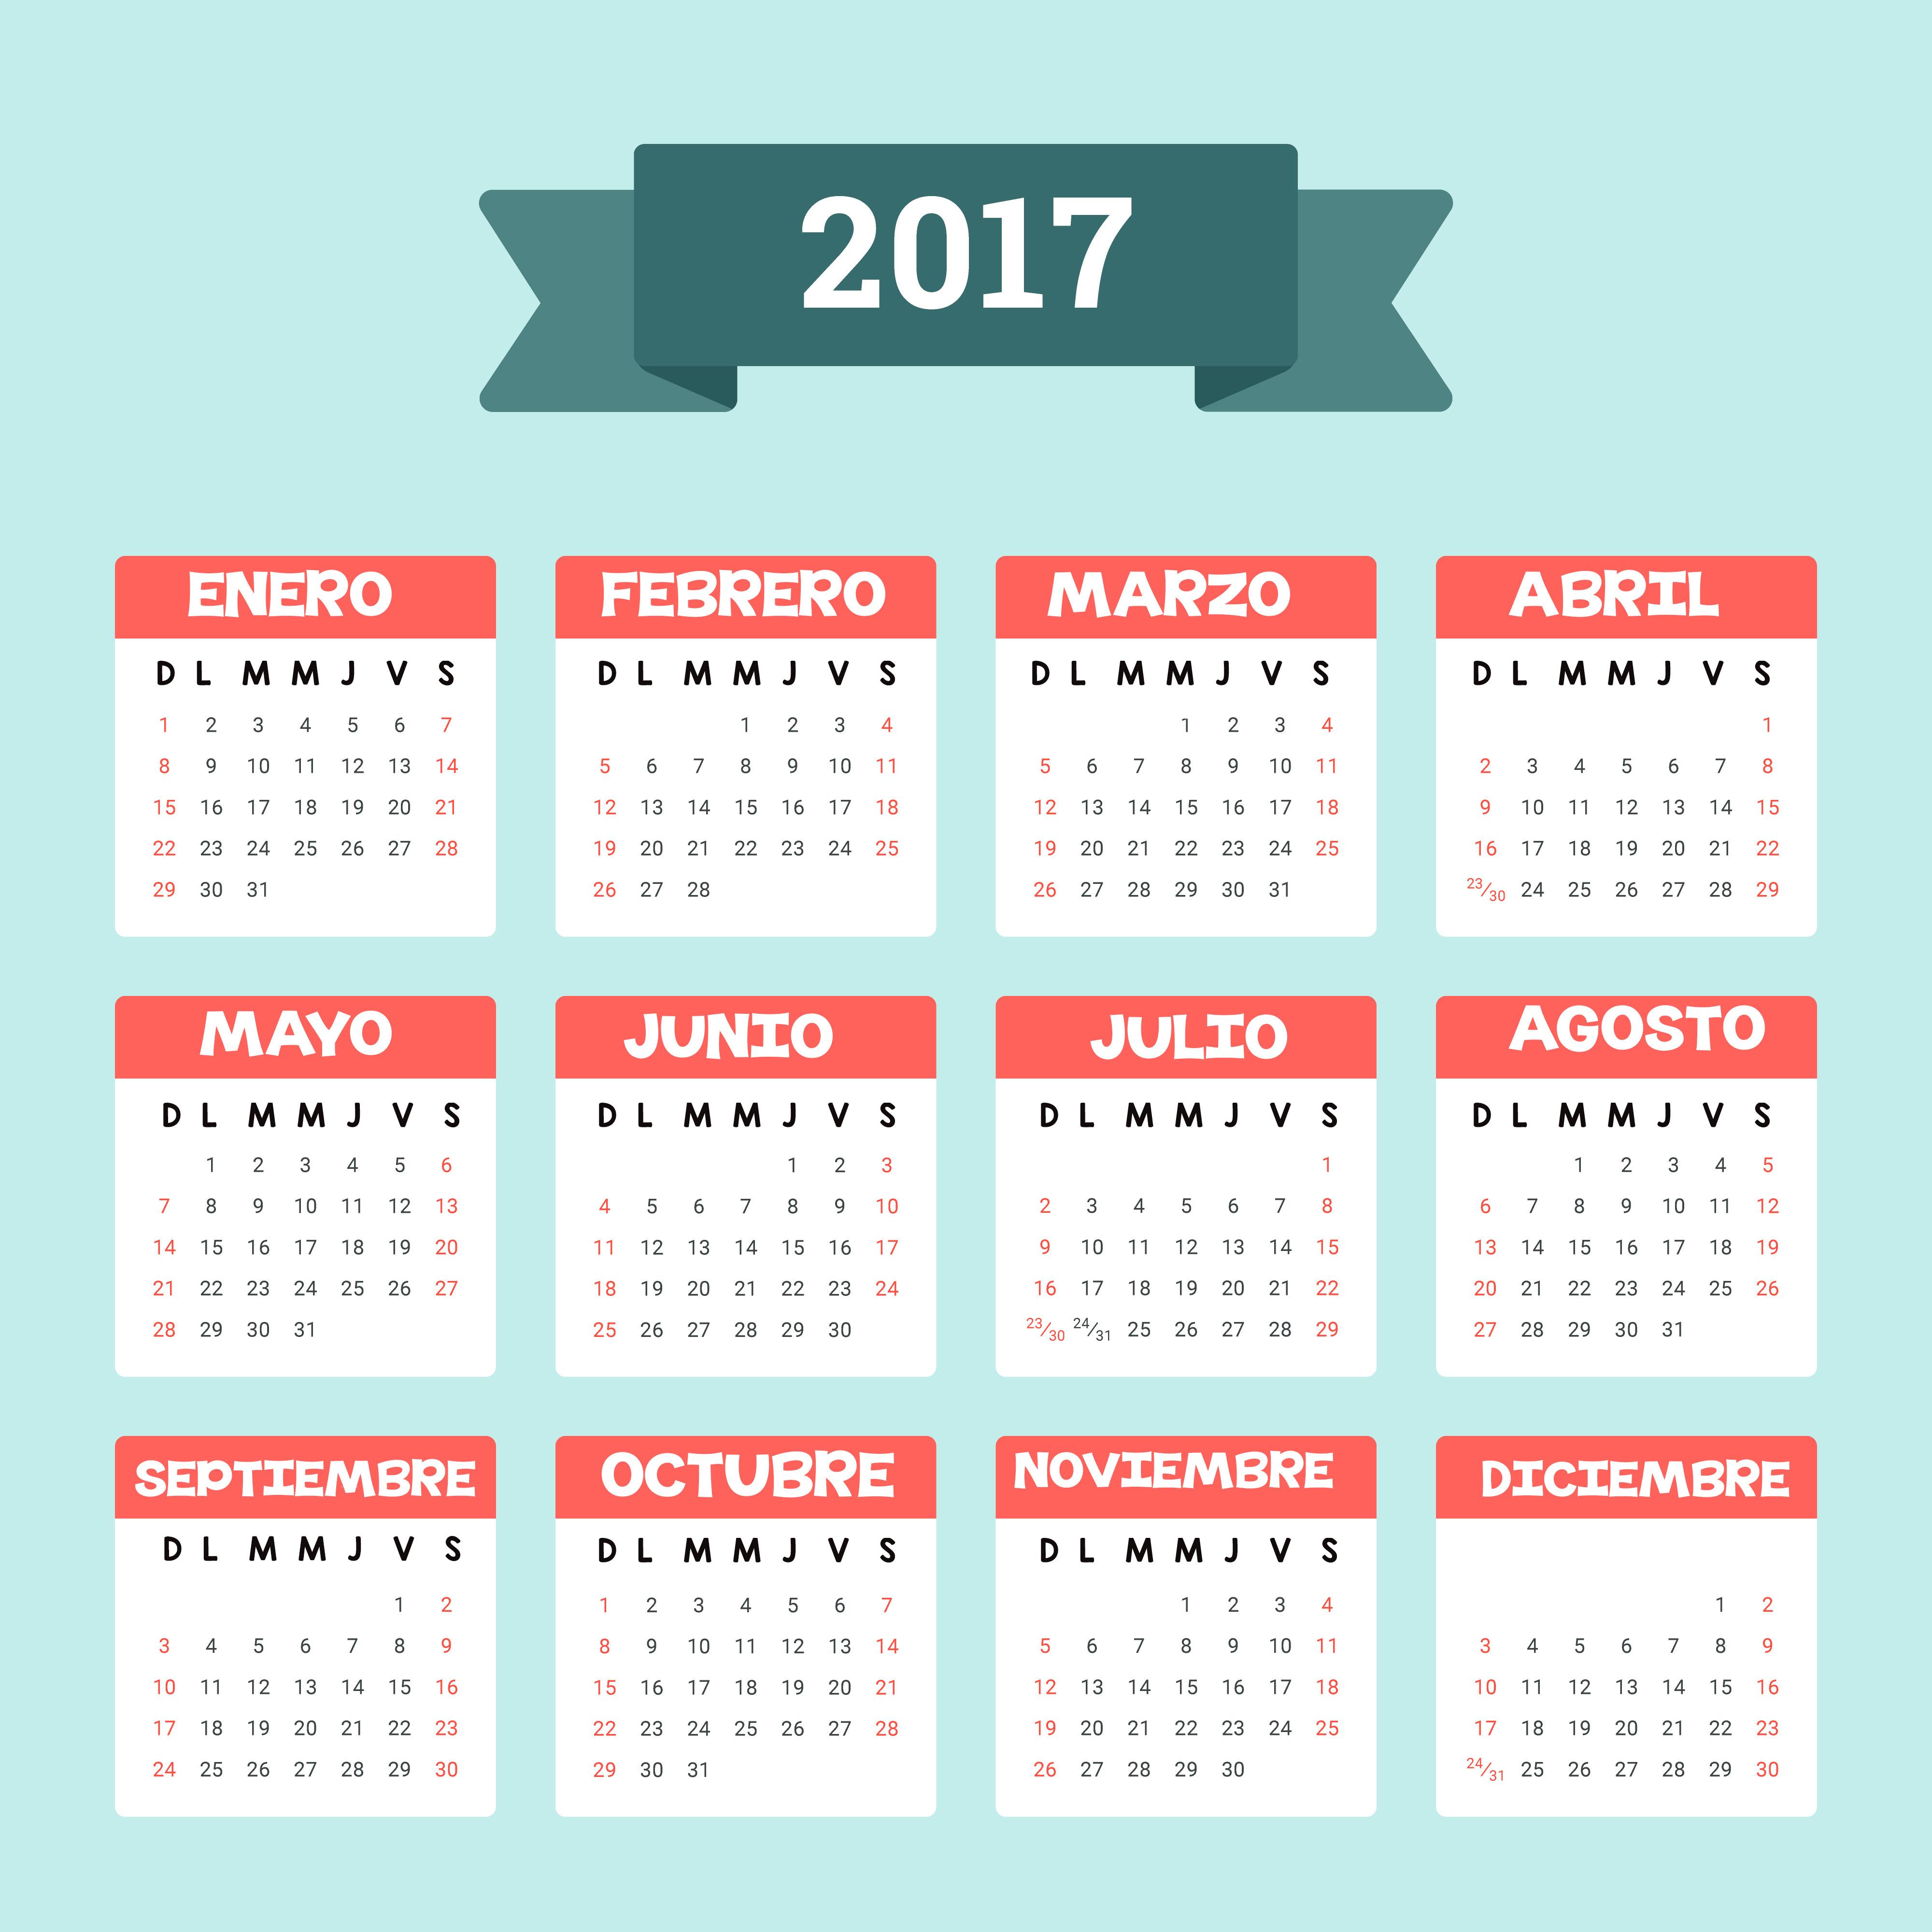 Calendar 2017 - Imagenes Educativas